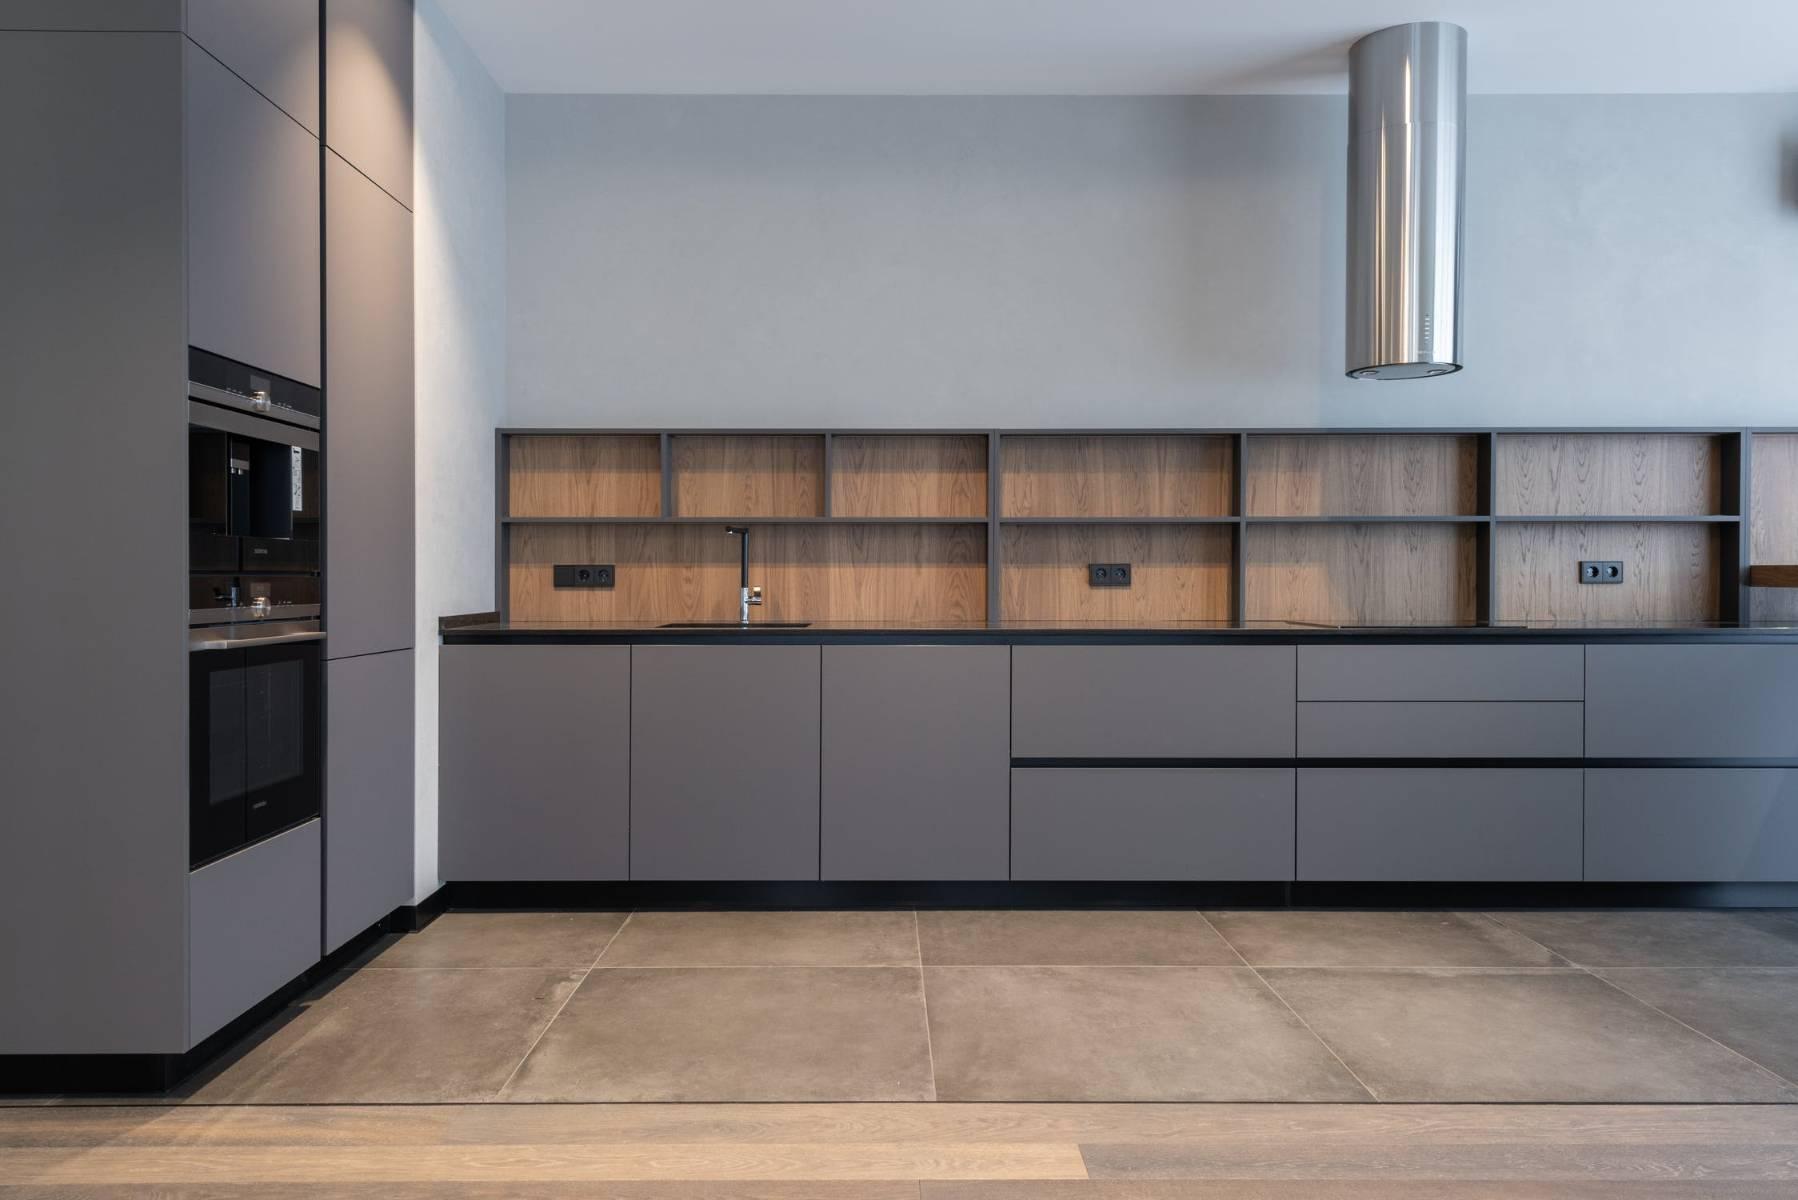 Shades of Gray Kitchen